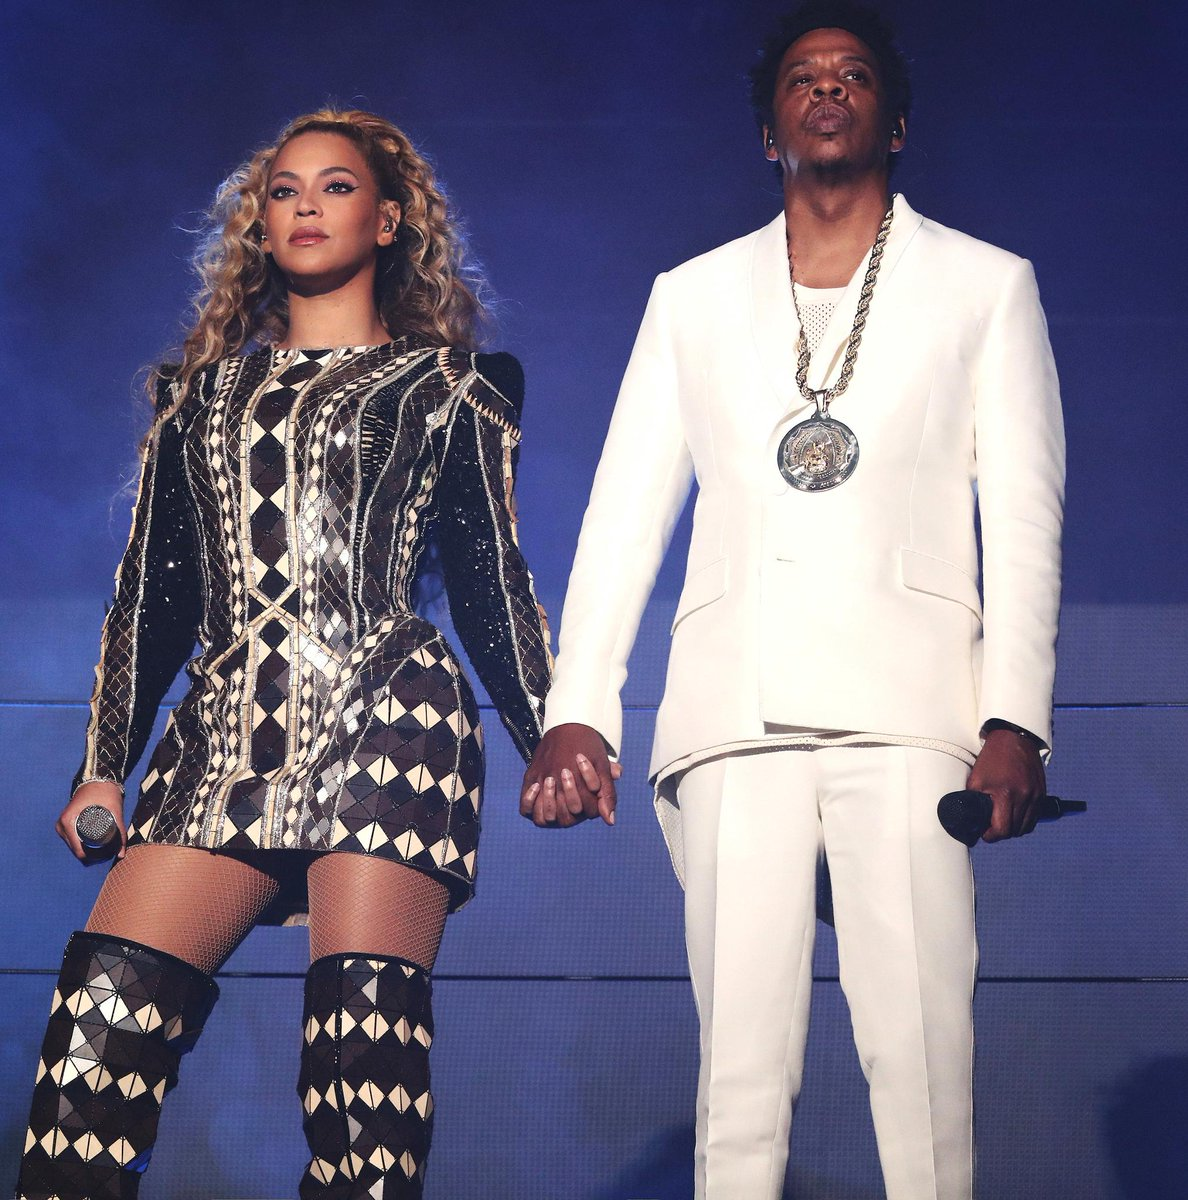 Cardi B, Beyoncé and JAY-Z, lead the 2018 MTV #VMAs nominations. See the full list: https://t.co/oFi5kbb3sm  https://t.co/Npvxdd6Hlu